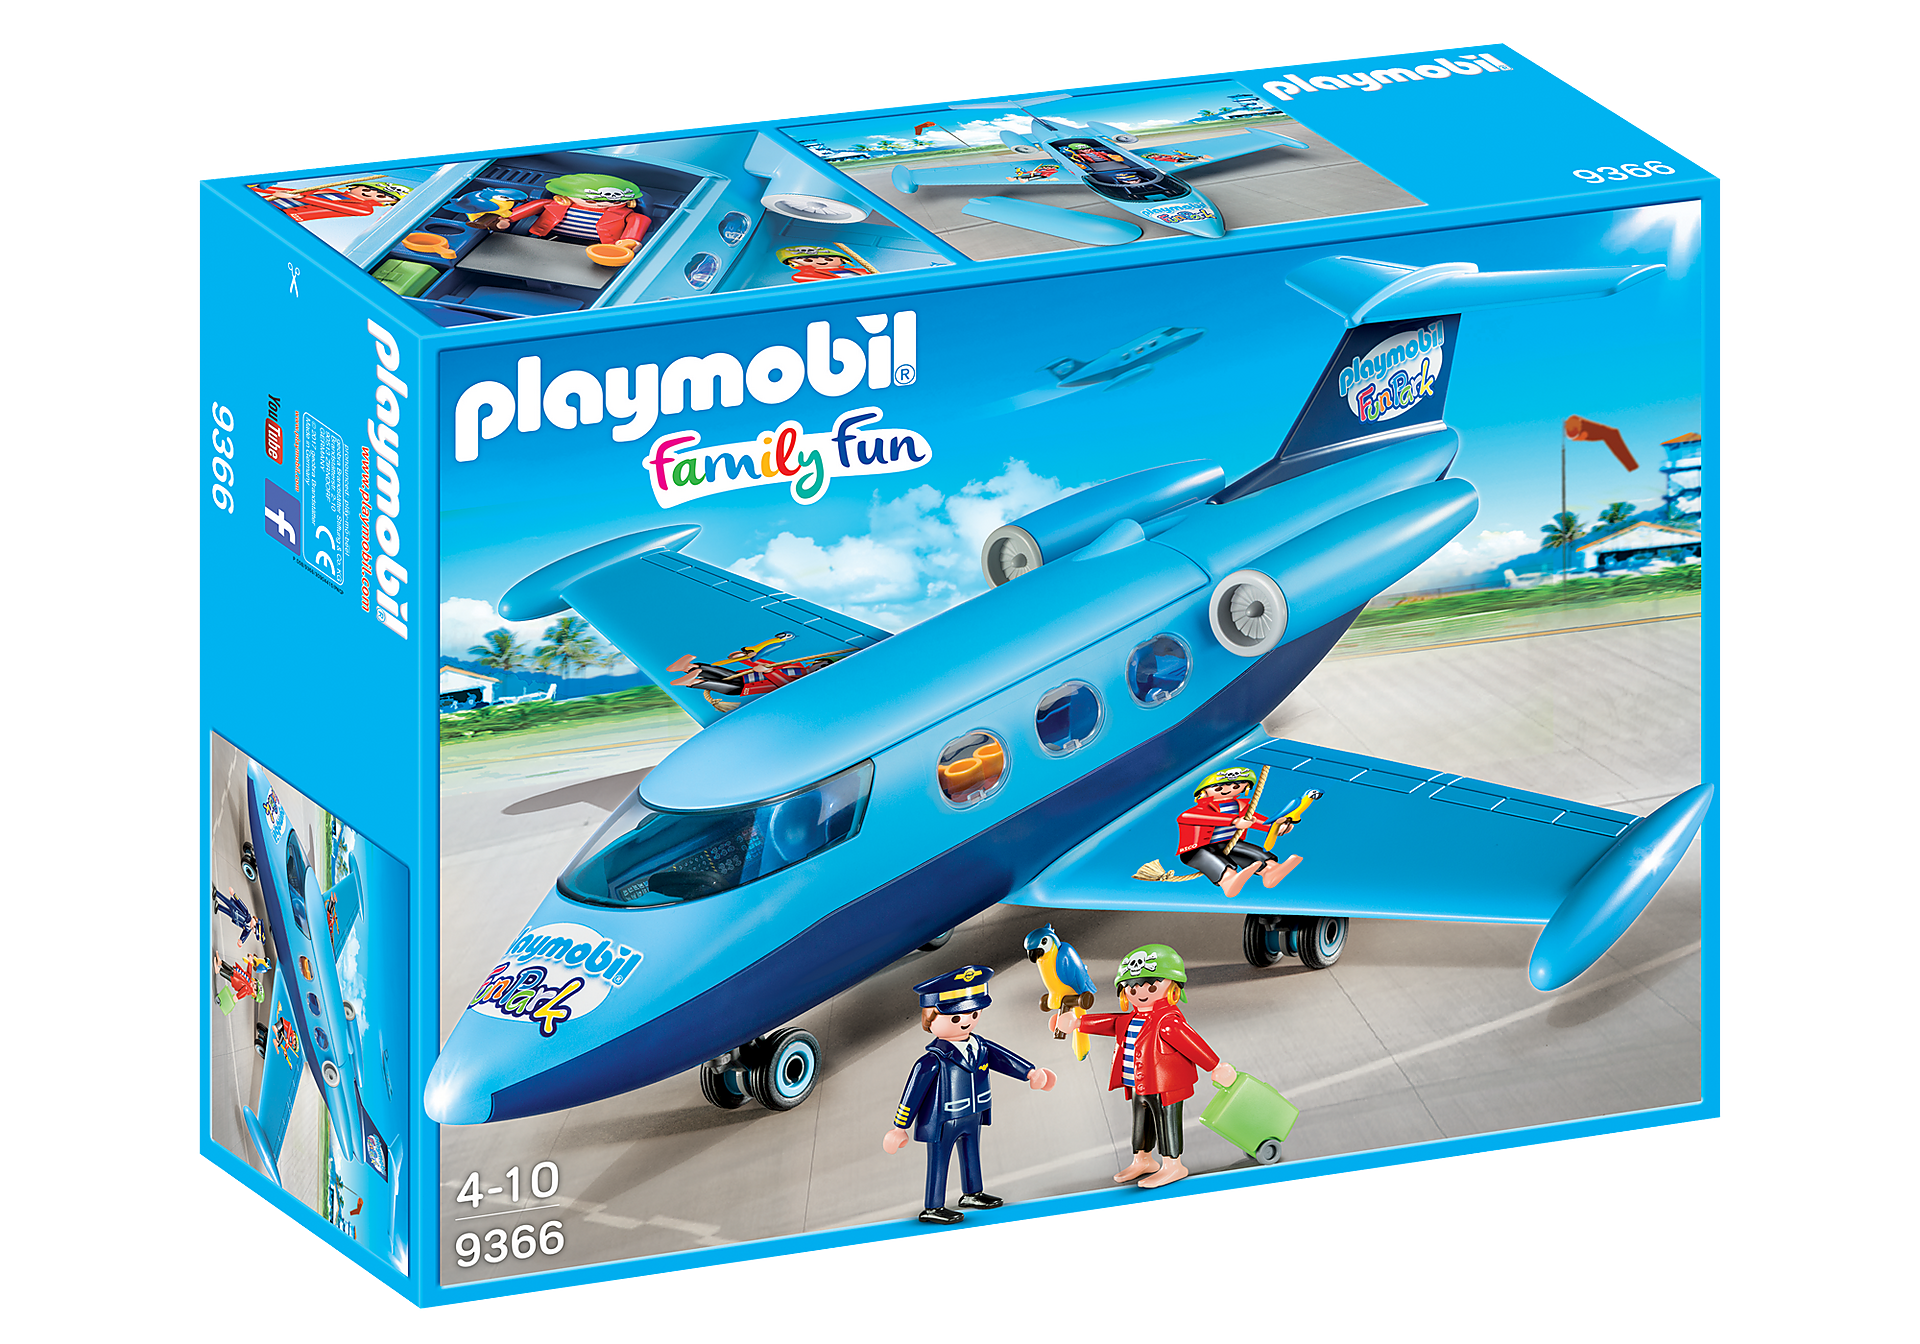 9366 PLAYMOBIL FunPark Summer Jet zoom image2